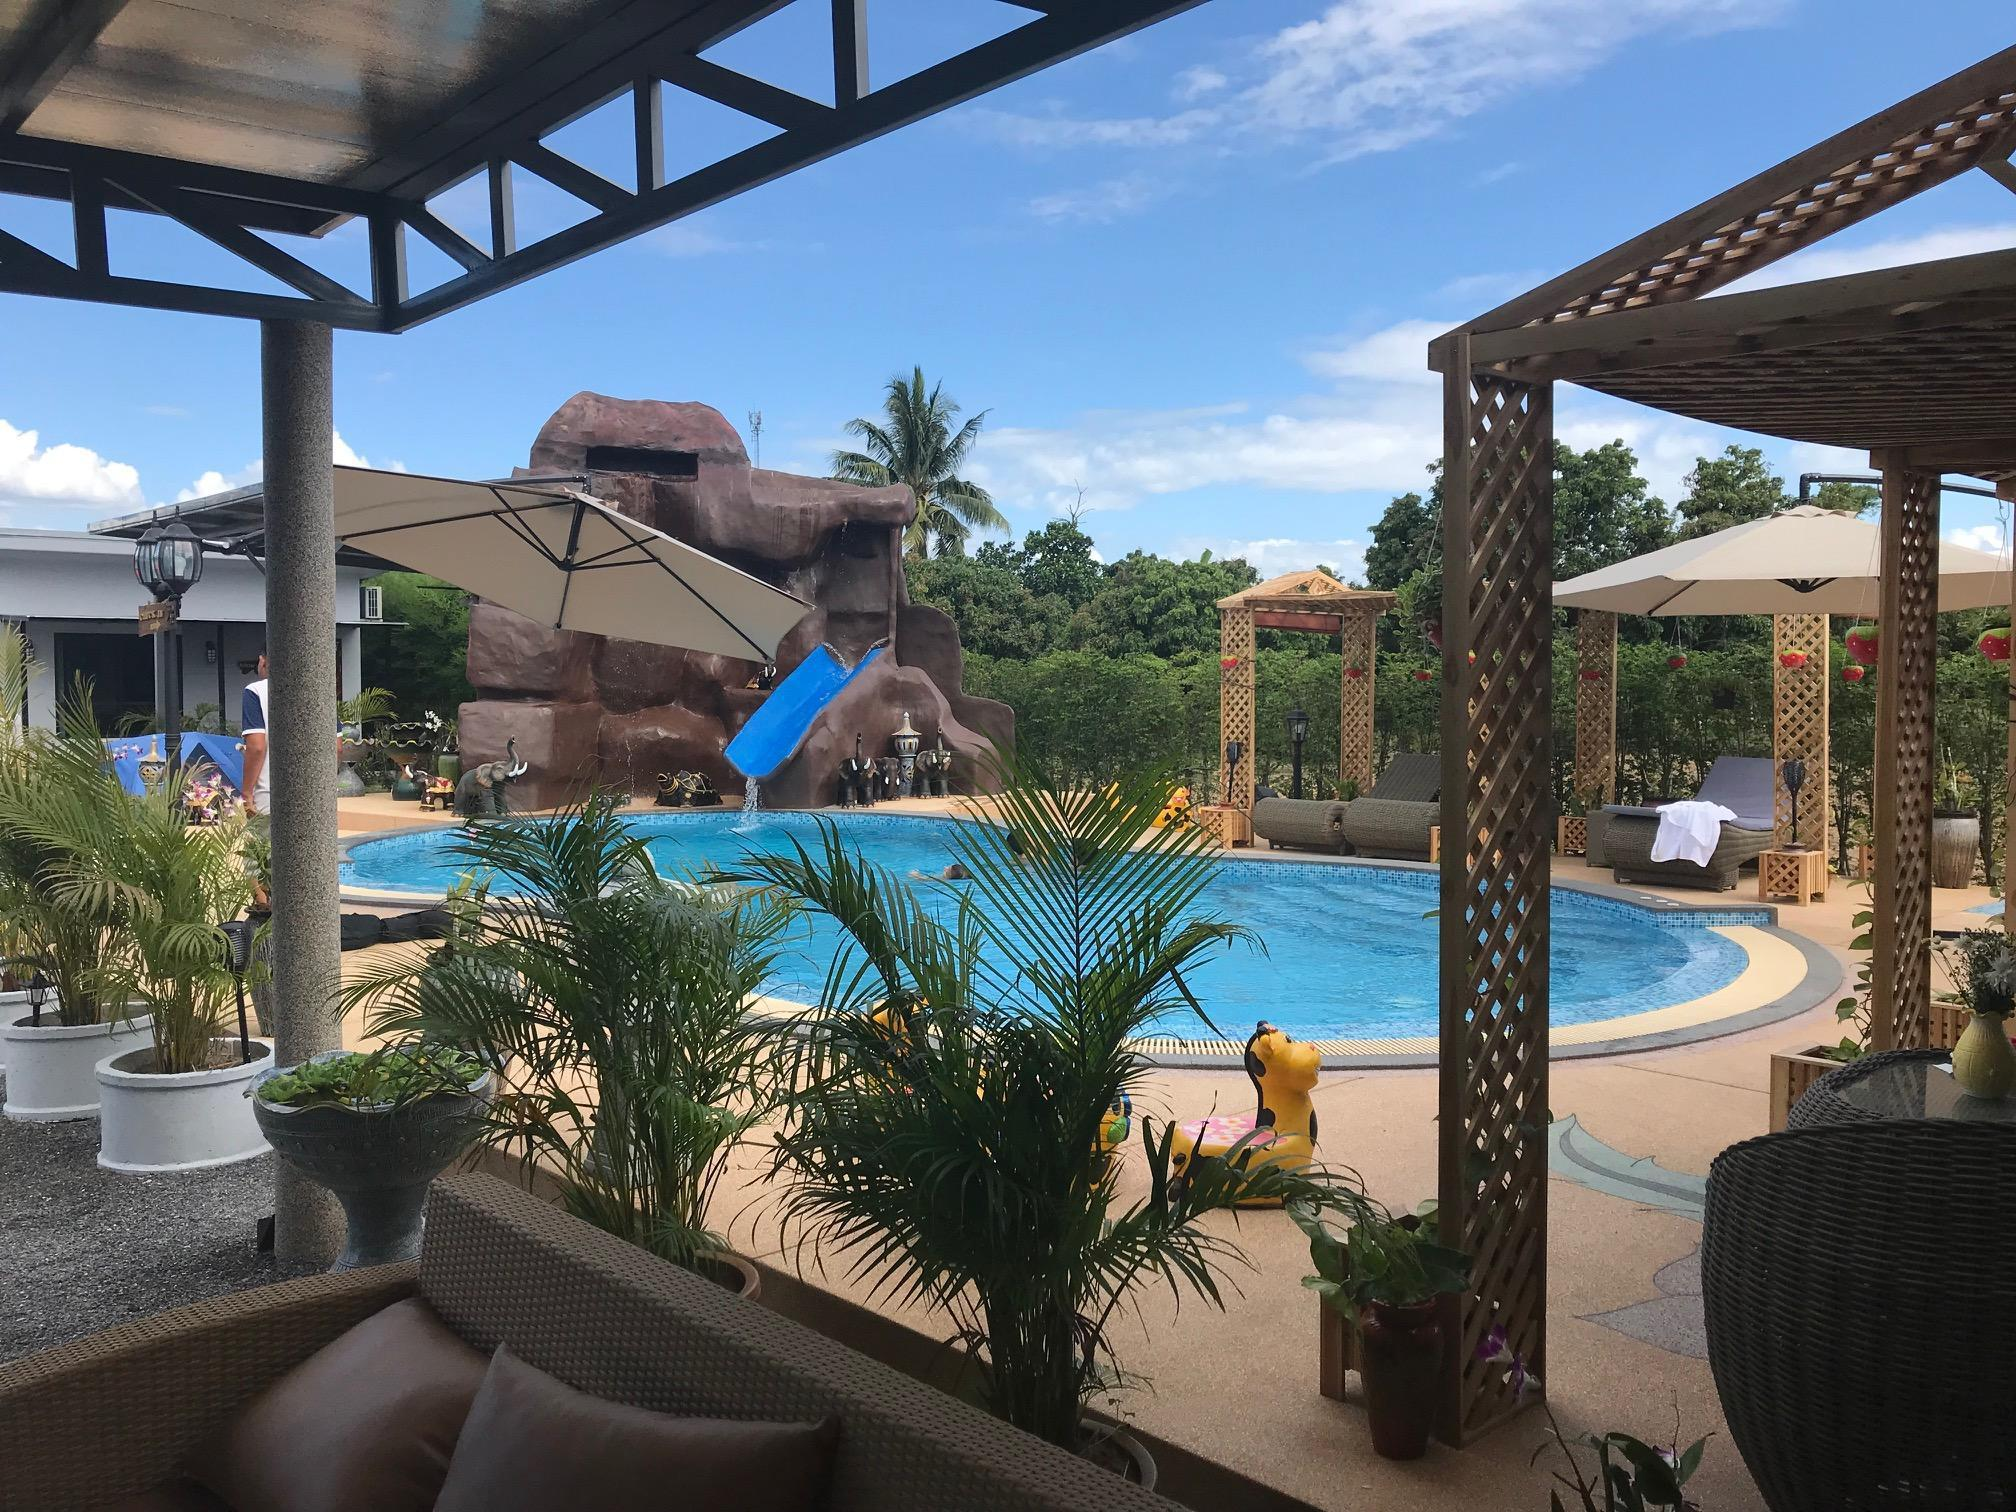 SB Holiday Resort บังกะโล 1 ห้องนอน 1 ห้องน้ำส่วนตัว ขนาด 35 ตร.ม. – สารภี